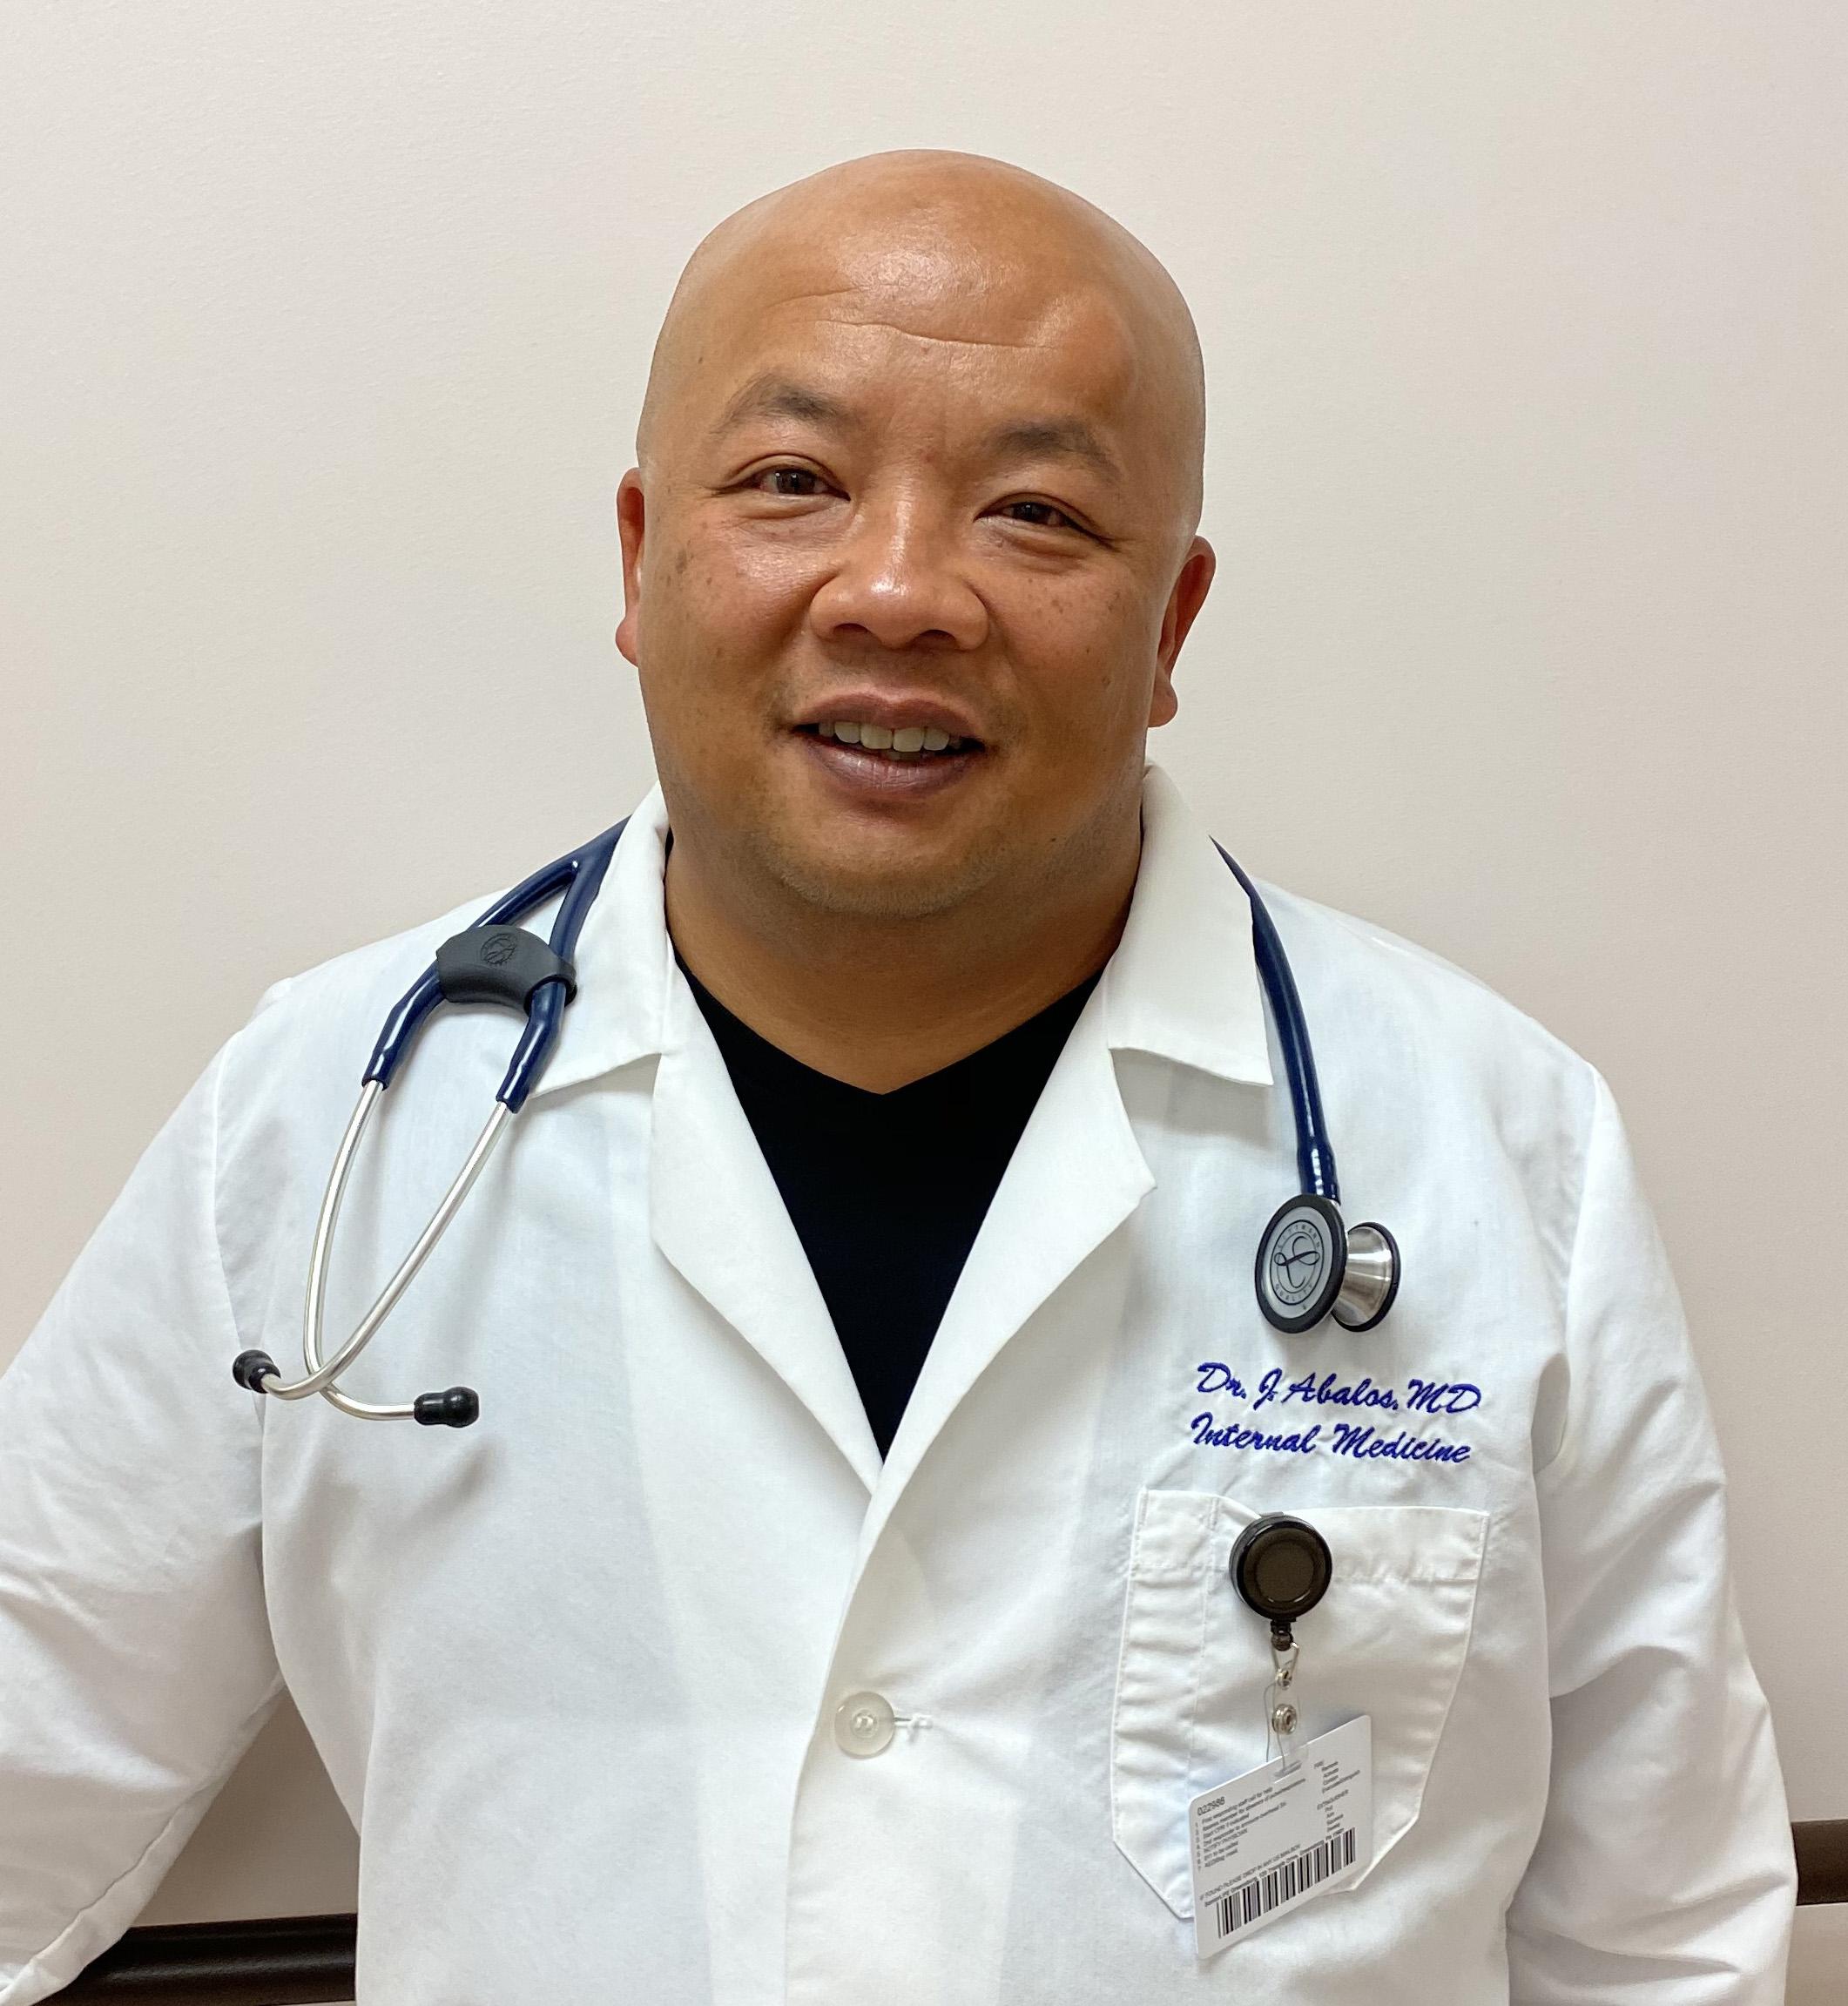 Doctor Jay Abalos